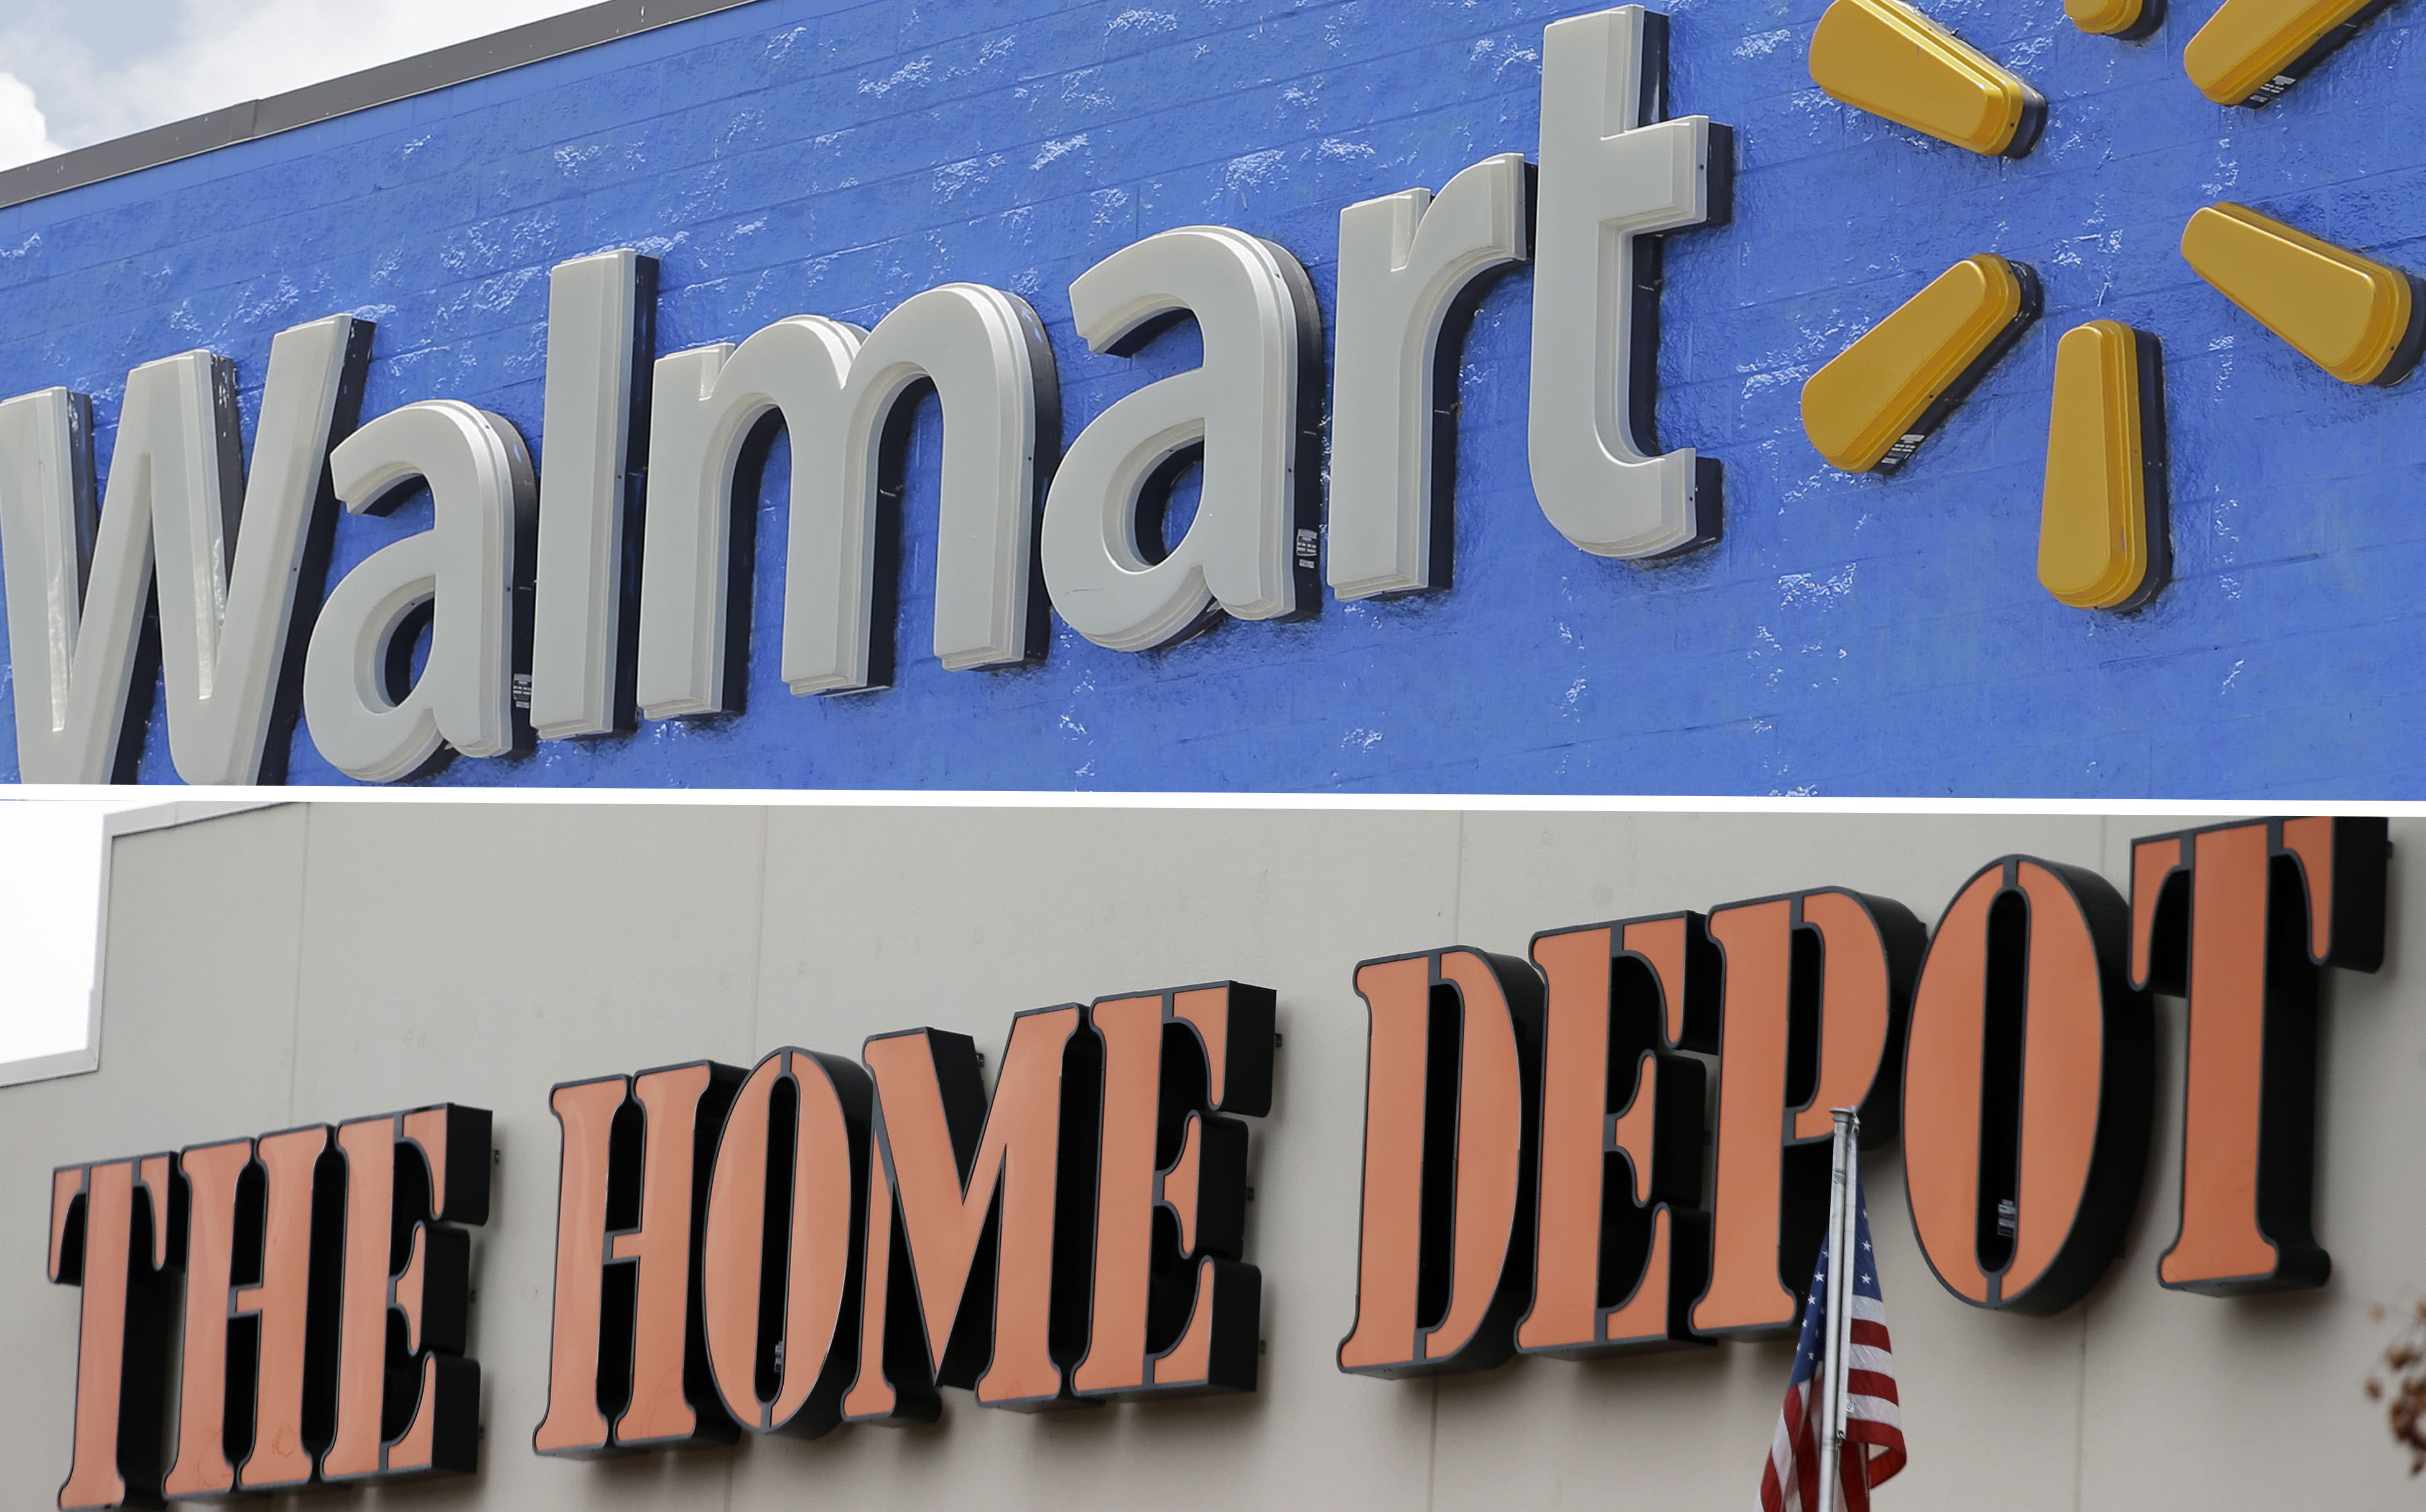 Walmart, Home Depot and other retailers walk back face mask mandates, will serve maskless customers ?u=https%3A%2F%2Fs.yimg.com%2Fuu%2Fapi%2Fres%2F1.2%2FqYfXpb4BR0r.X7xgW1HTvg--~B%2FaD0yNDMxO3c9MzkwMDtzbT0xO2FwcGlkPXl0YWNoeW9u%2Fhttps%3A%2F%2Fs.yimg.com%2Fos%2Fcreatr-images%2FGLB%2F2017-11-13%2F34288a00-c88f-11e7-ae72-c76f0195d207_walmart-home-depot-thumb